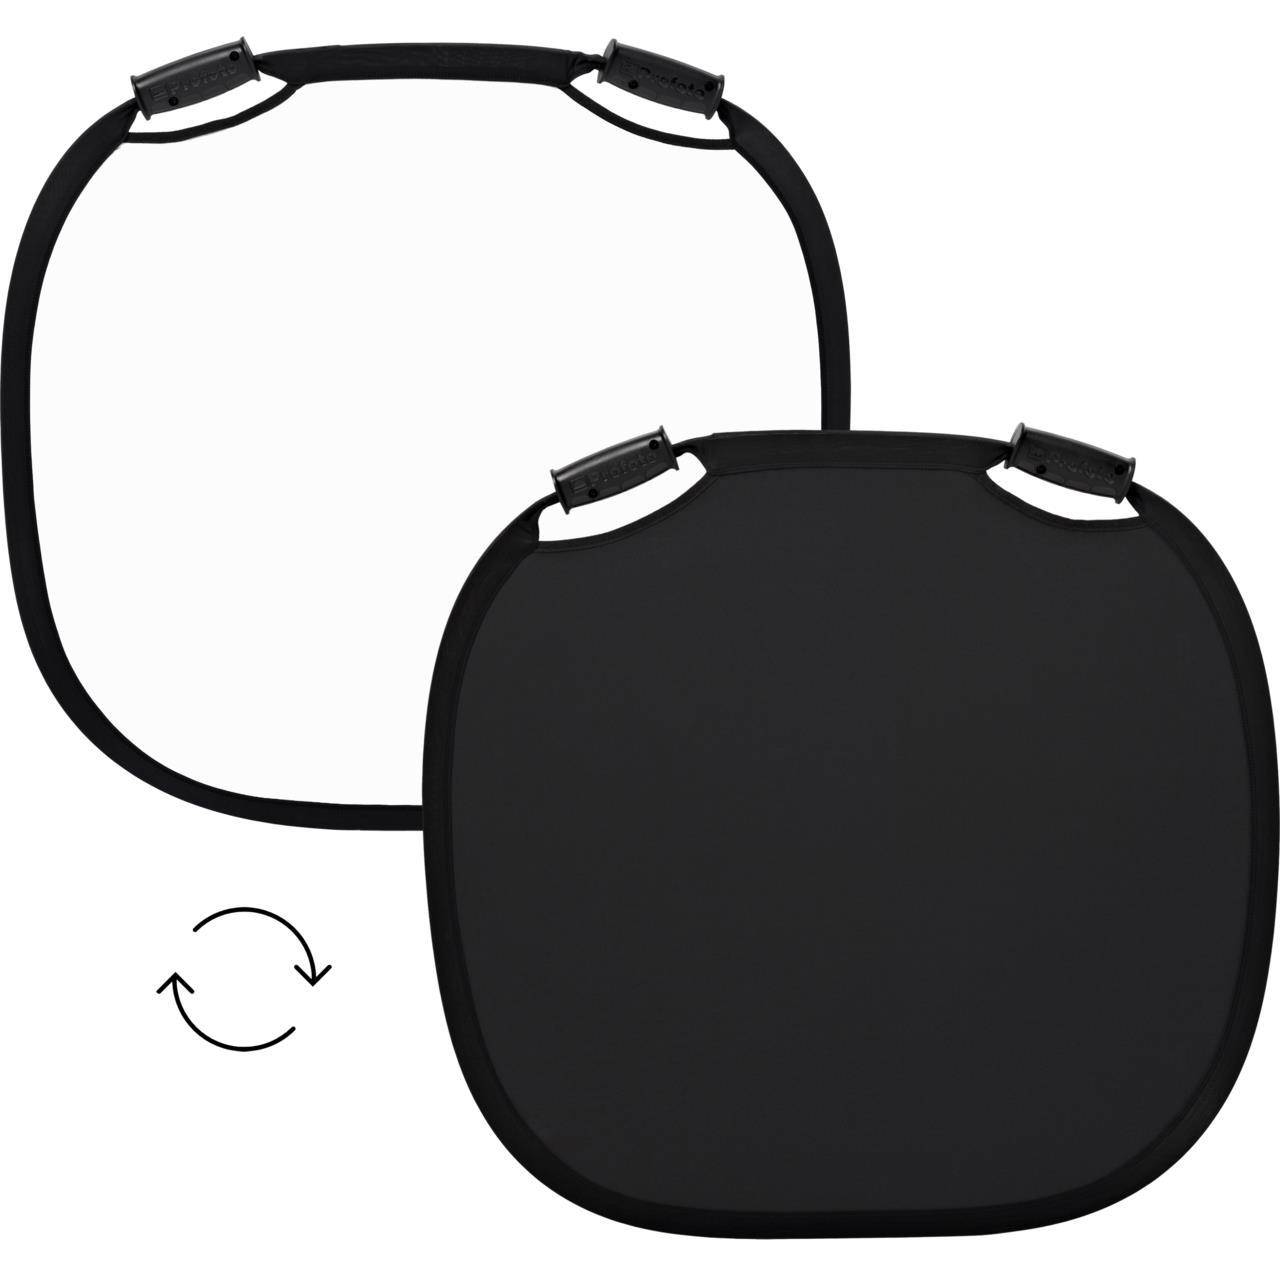 Profoto Collapsible Reflector White/Black M - 5€ Day/Unit